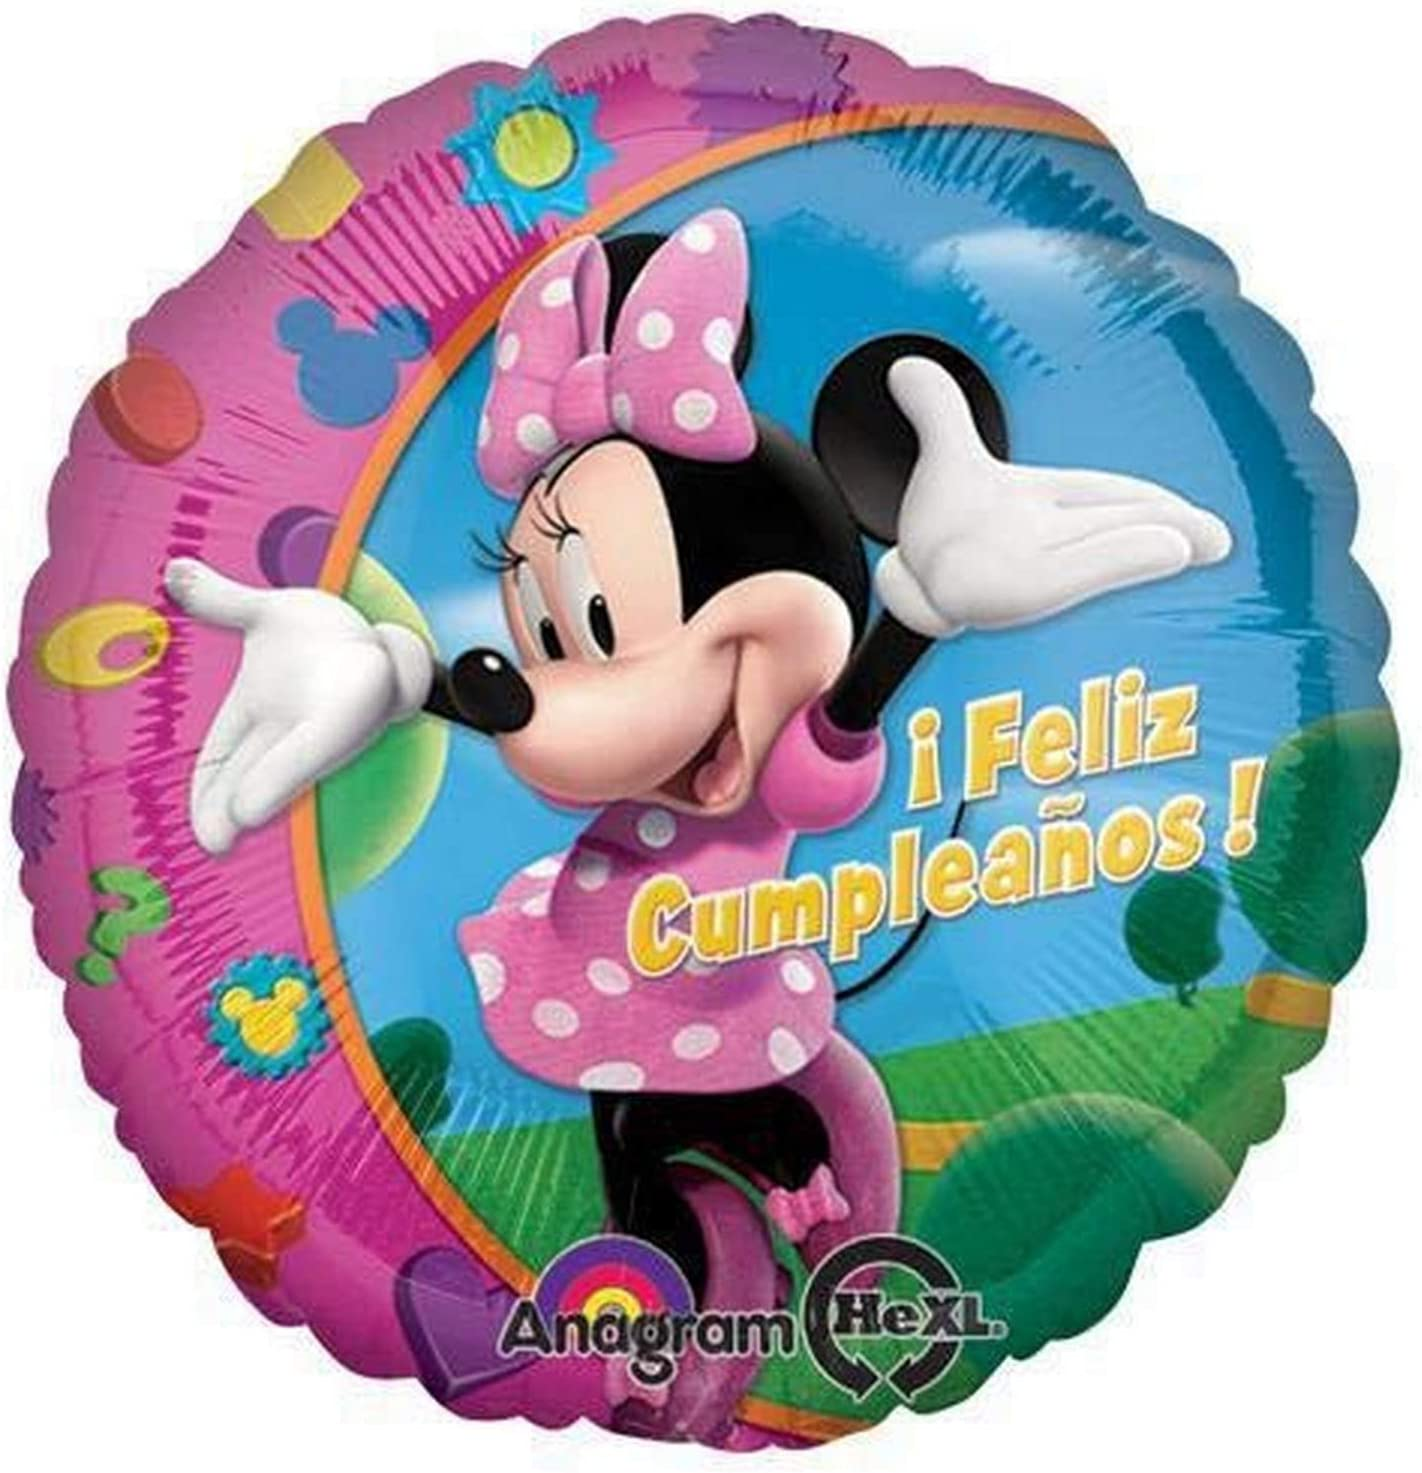 Multicolored Anagram Minnie Feliz Cumpleanos Foil Balloon 18